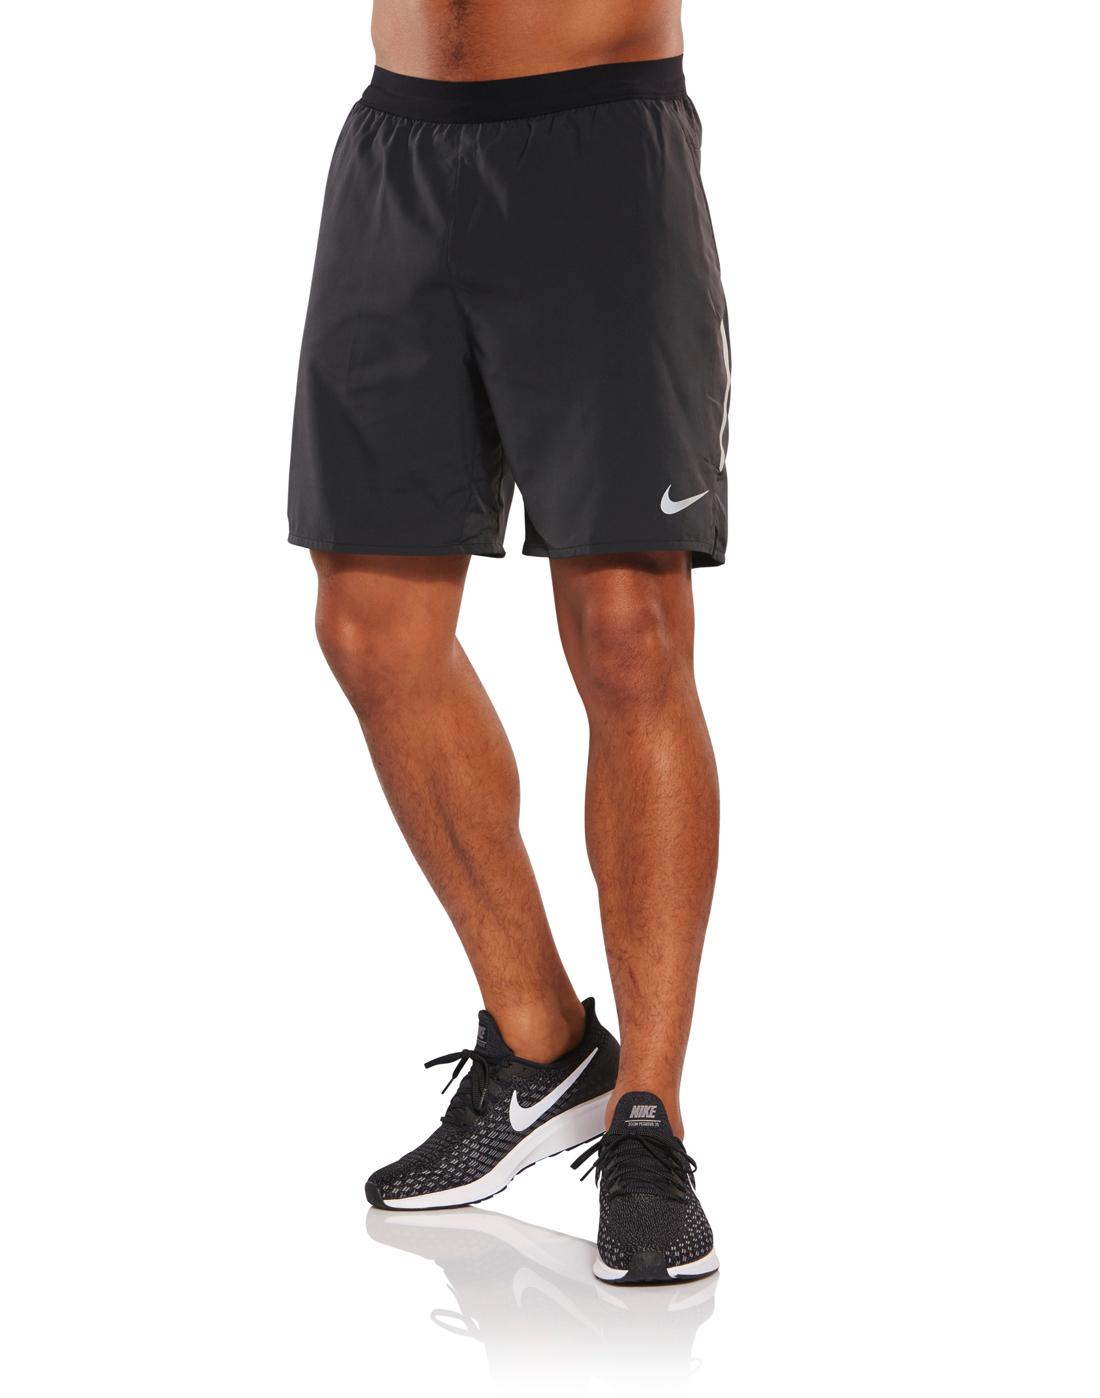 promo code 8b698 9373c Mens Flex Distance 7 Inch Shorts ...